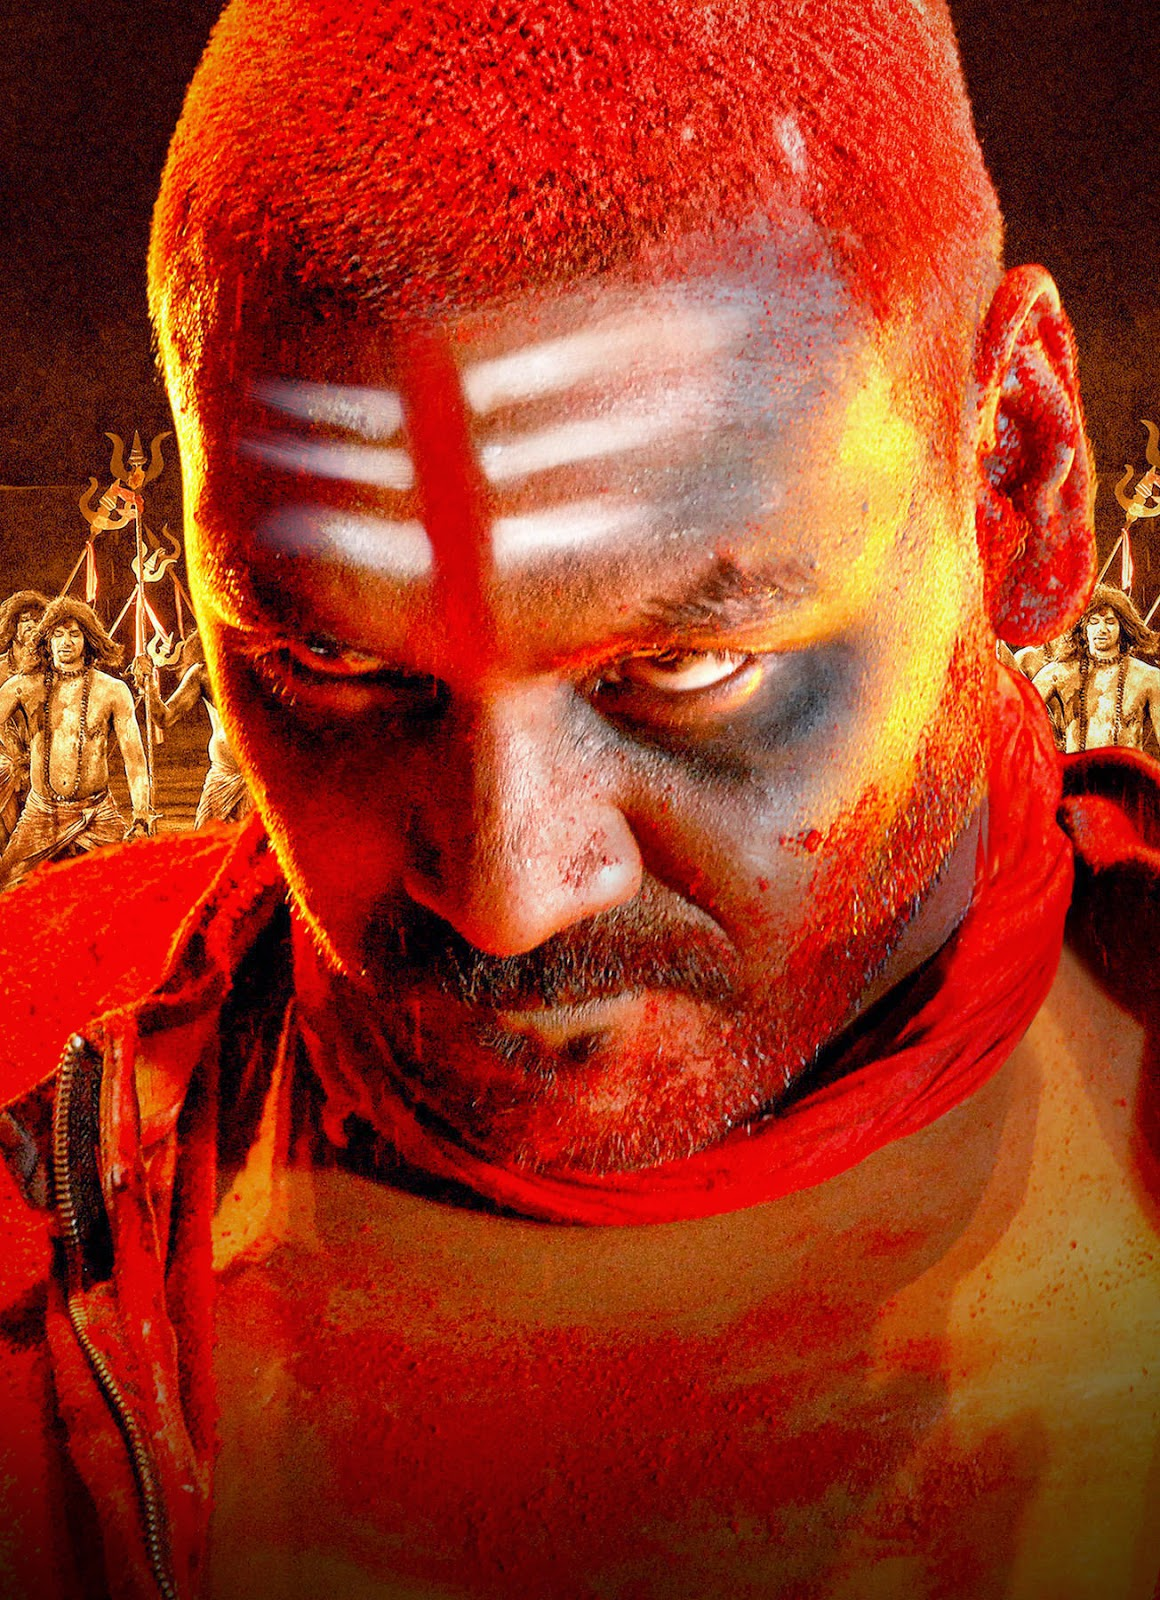 [Image: Raghava-Lawrence-Kanchana-2-Movie-Stills...%2B(7).jpg]